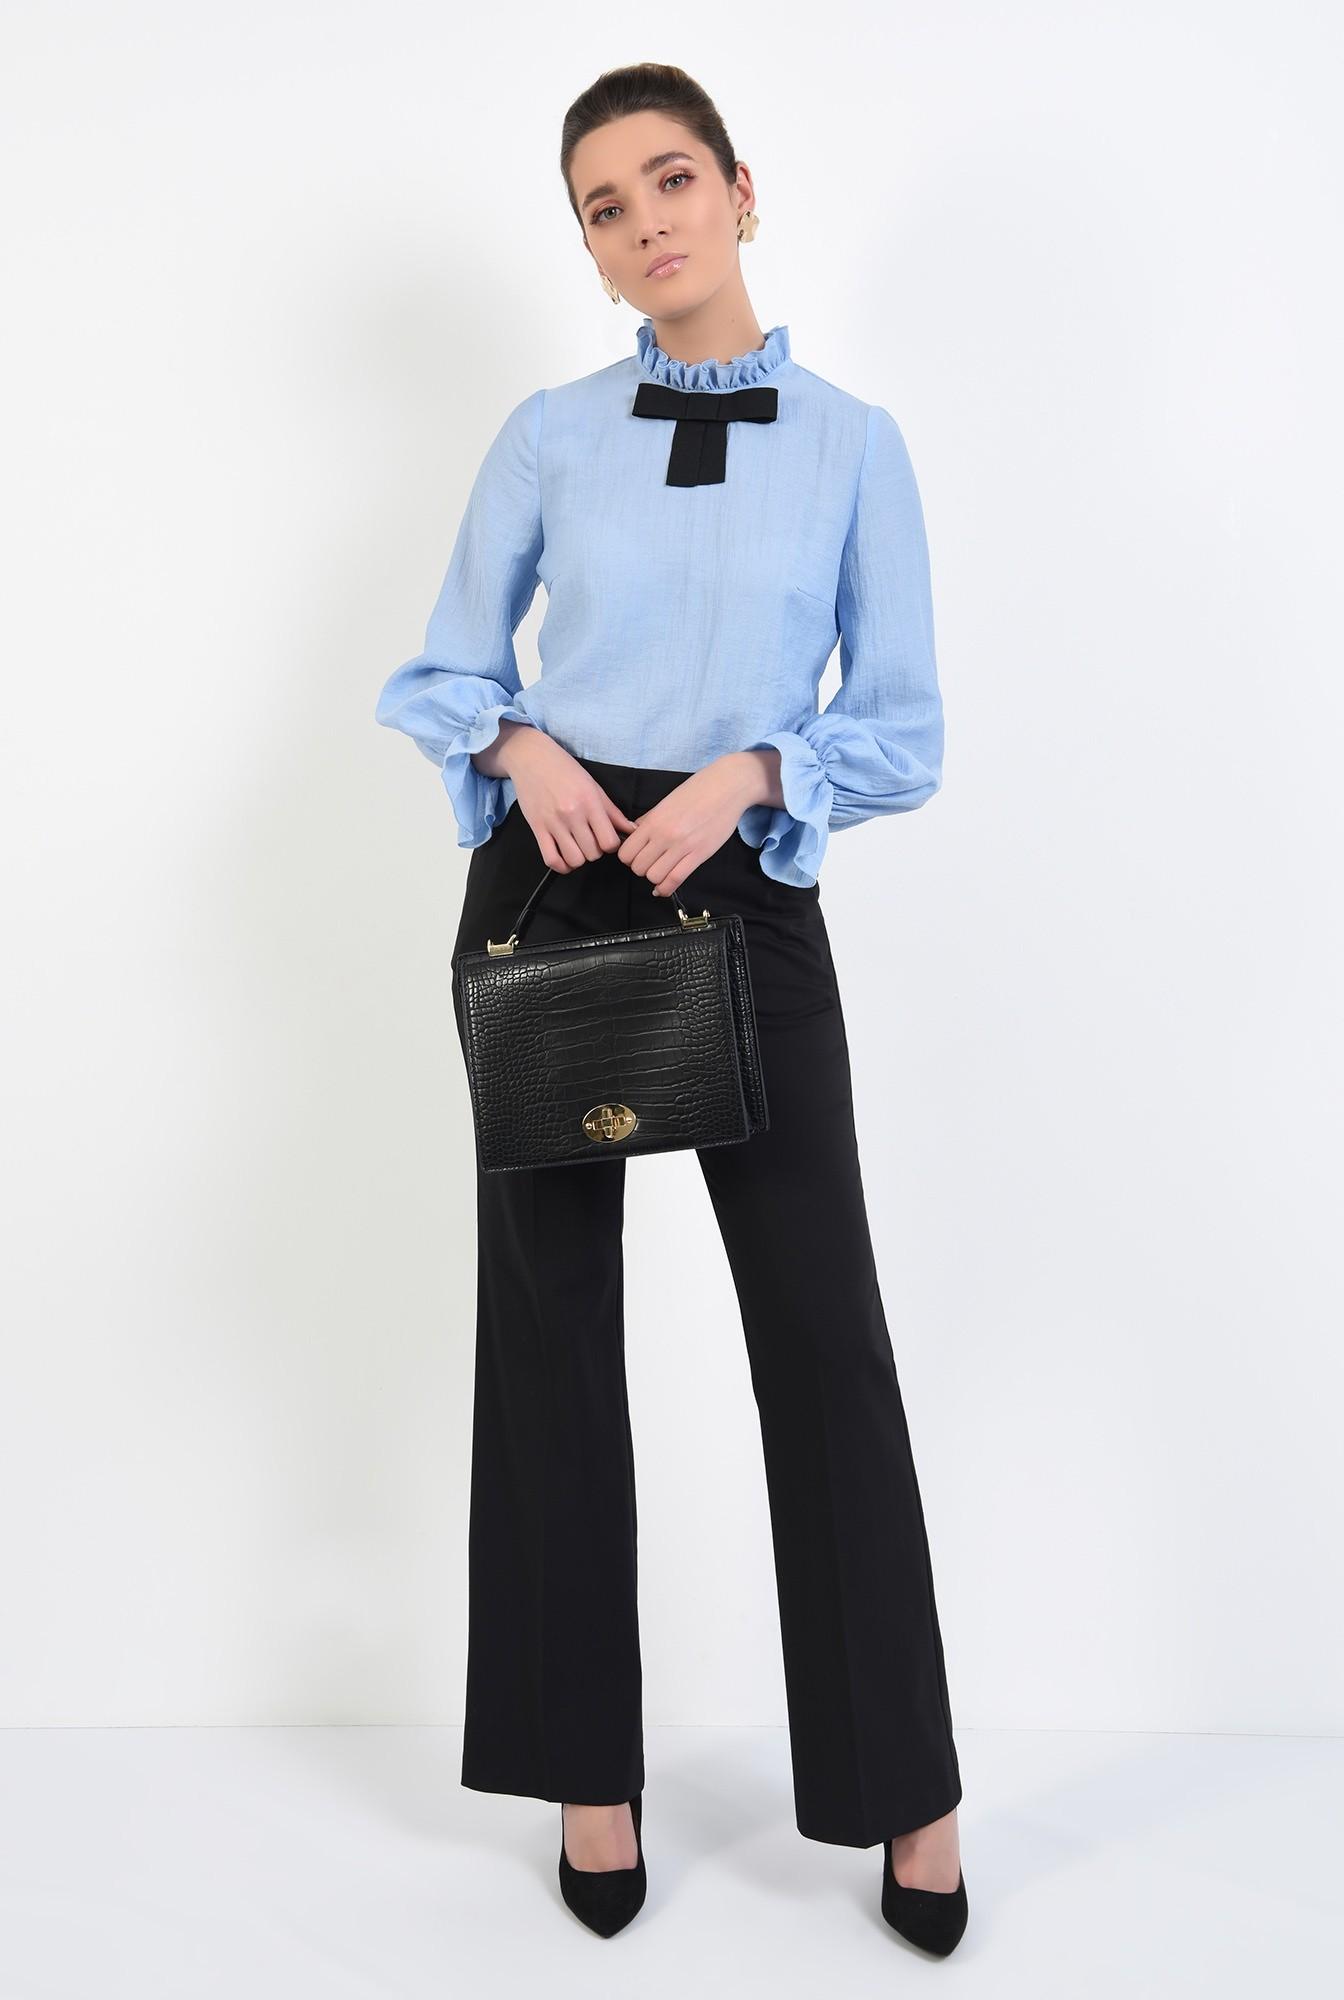 0 - pantaloni eleganti, drepti, casual, cu talie inalta, pantaloni de primavara, Poema